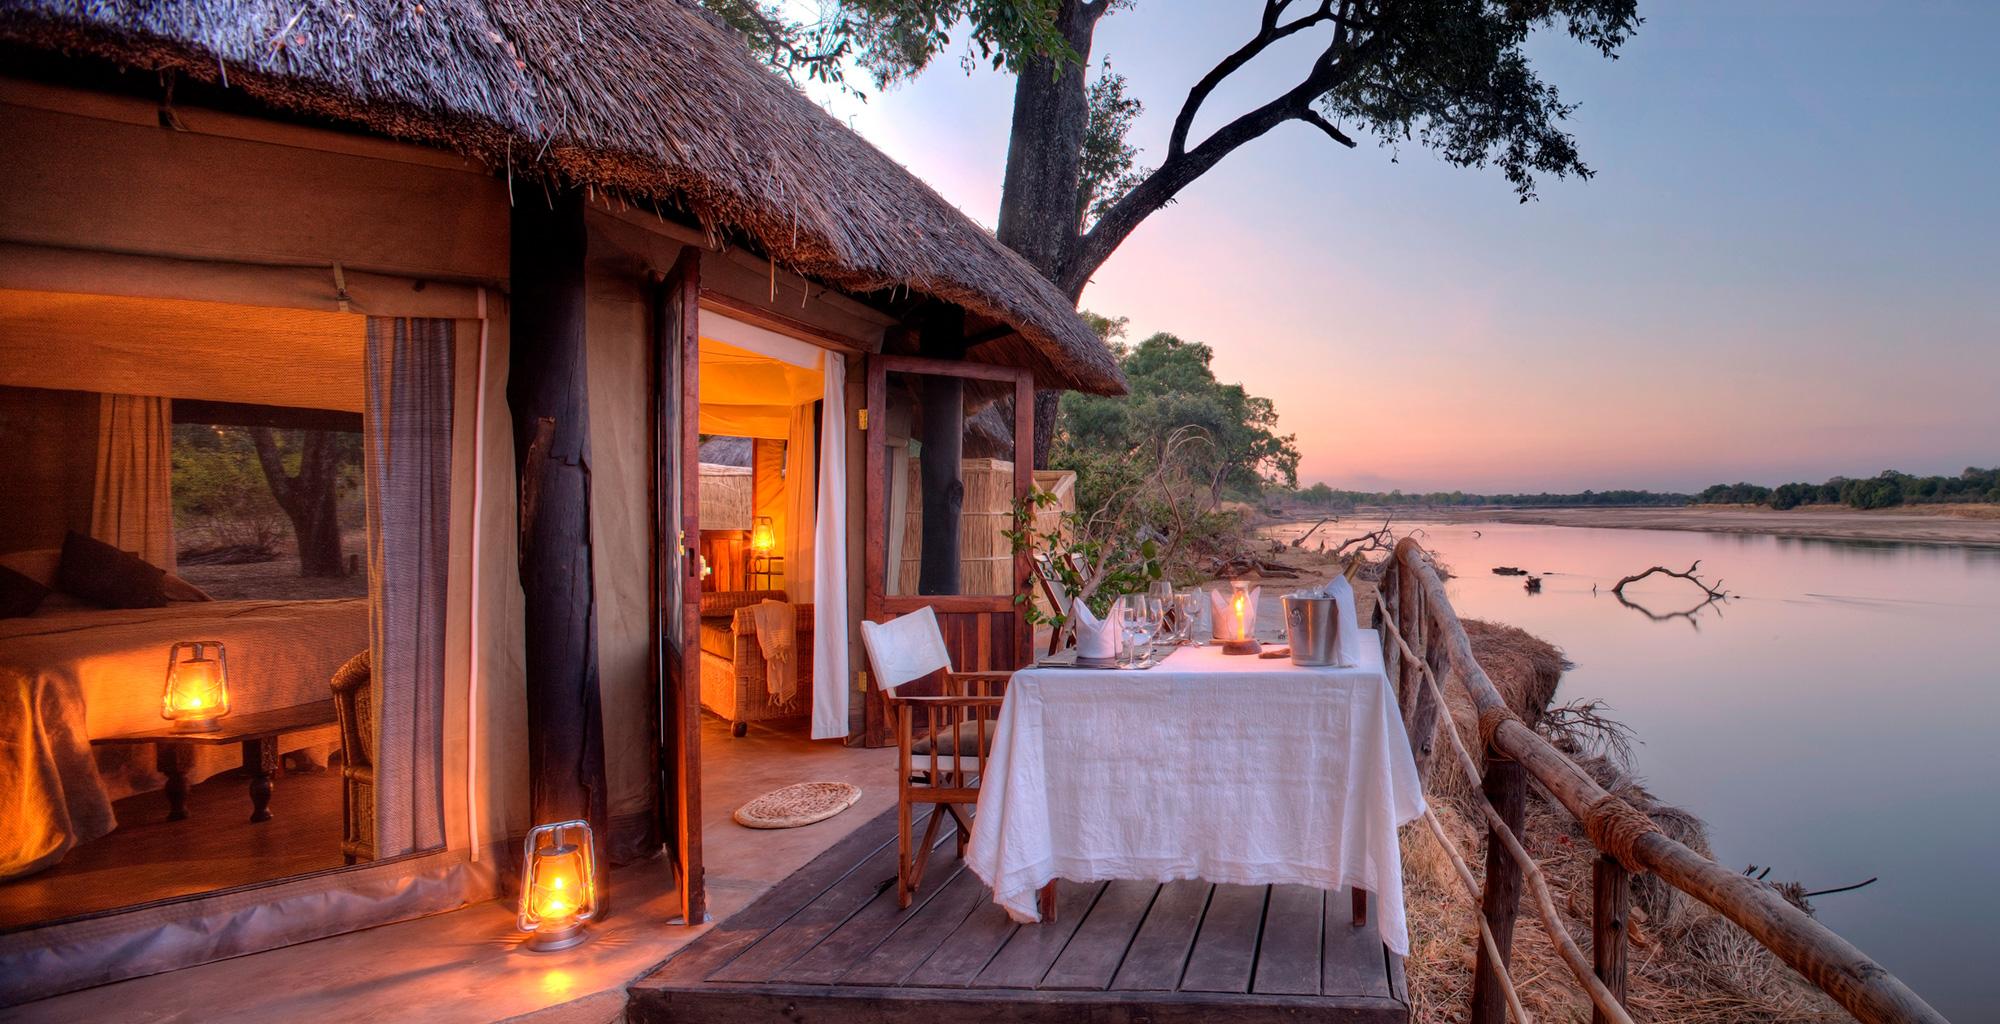 Zambia,-Mchenja-Camp,-Exterior-Sunset